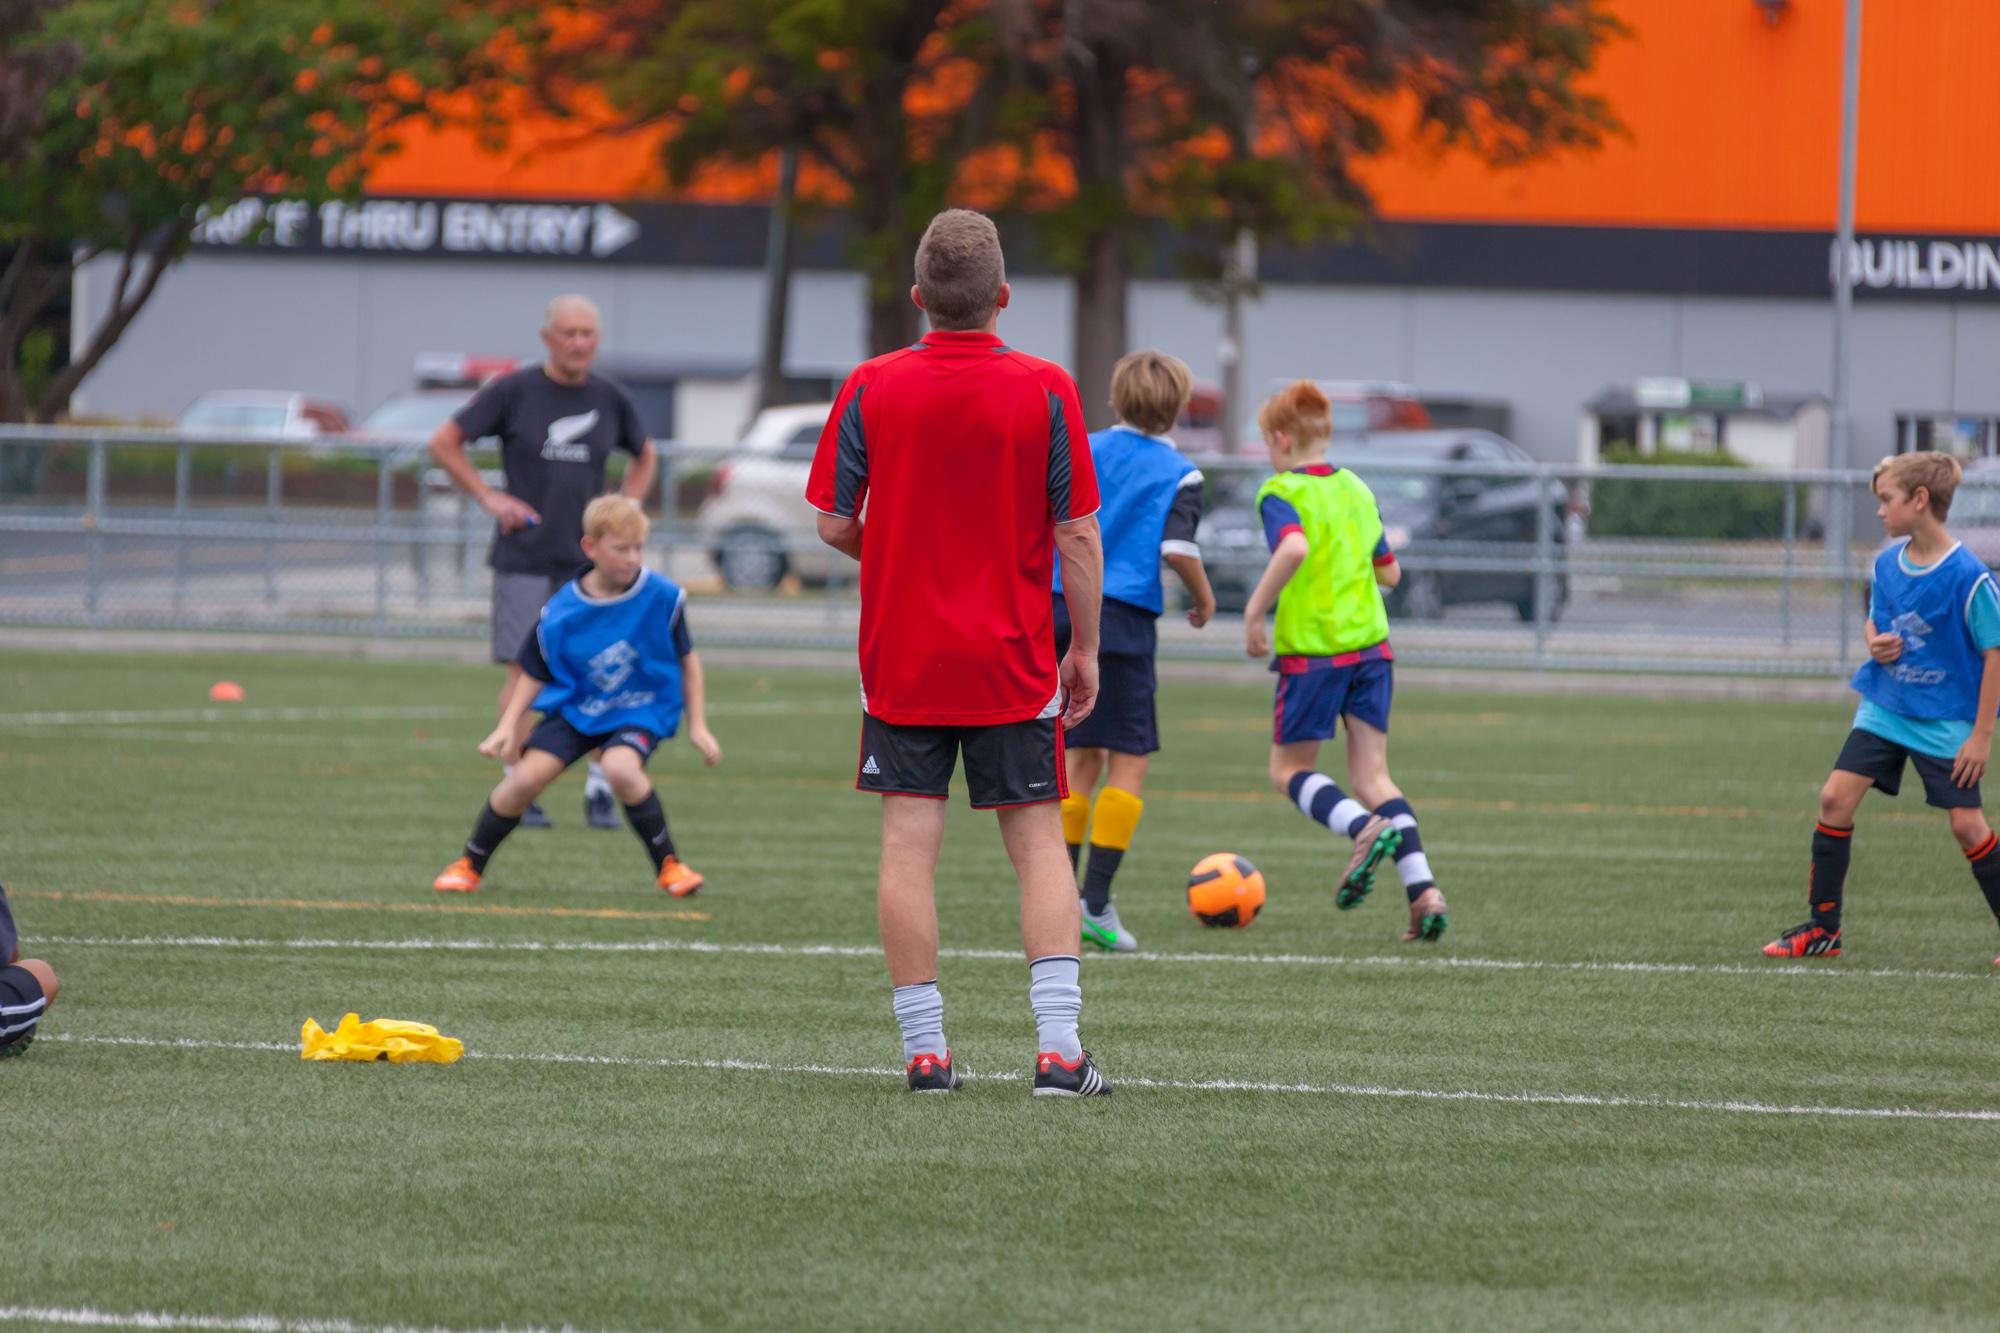 UHCC Soccer Coach 4476